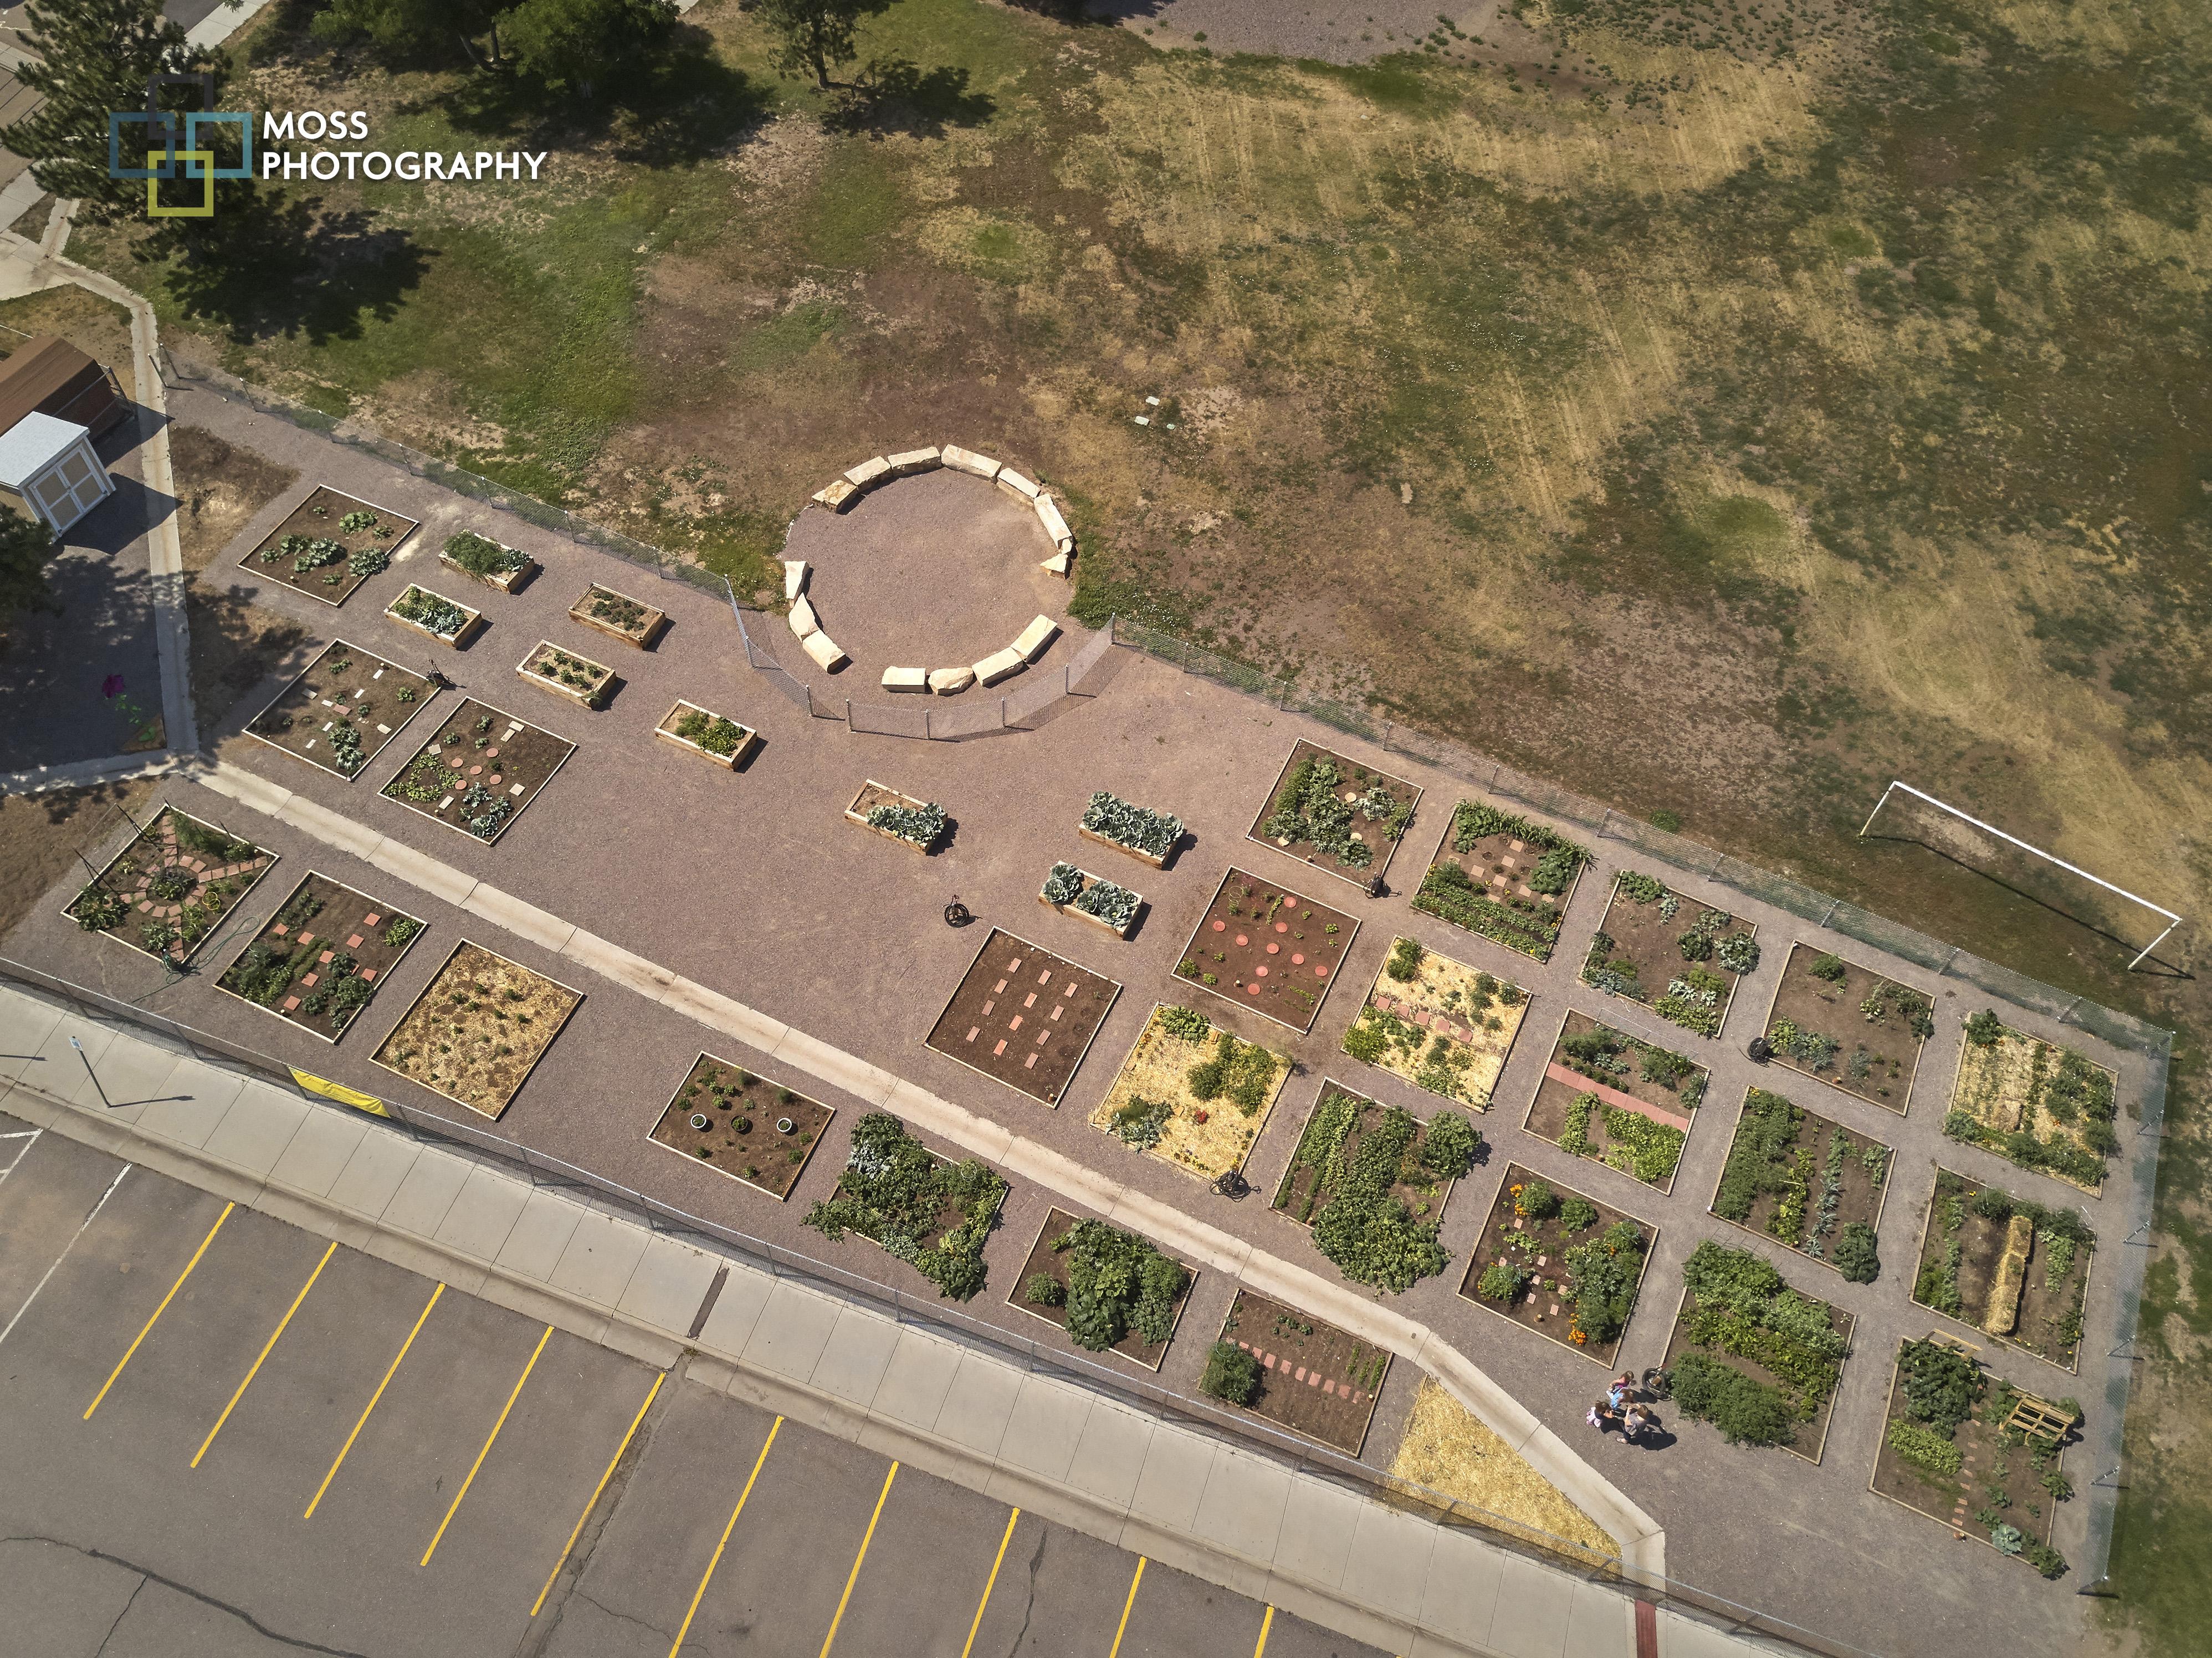 School/Community Garden Success | Help us plan the next Community ...